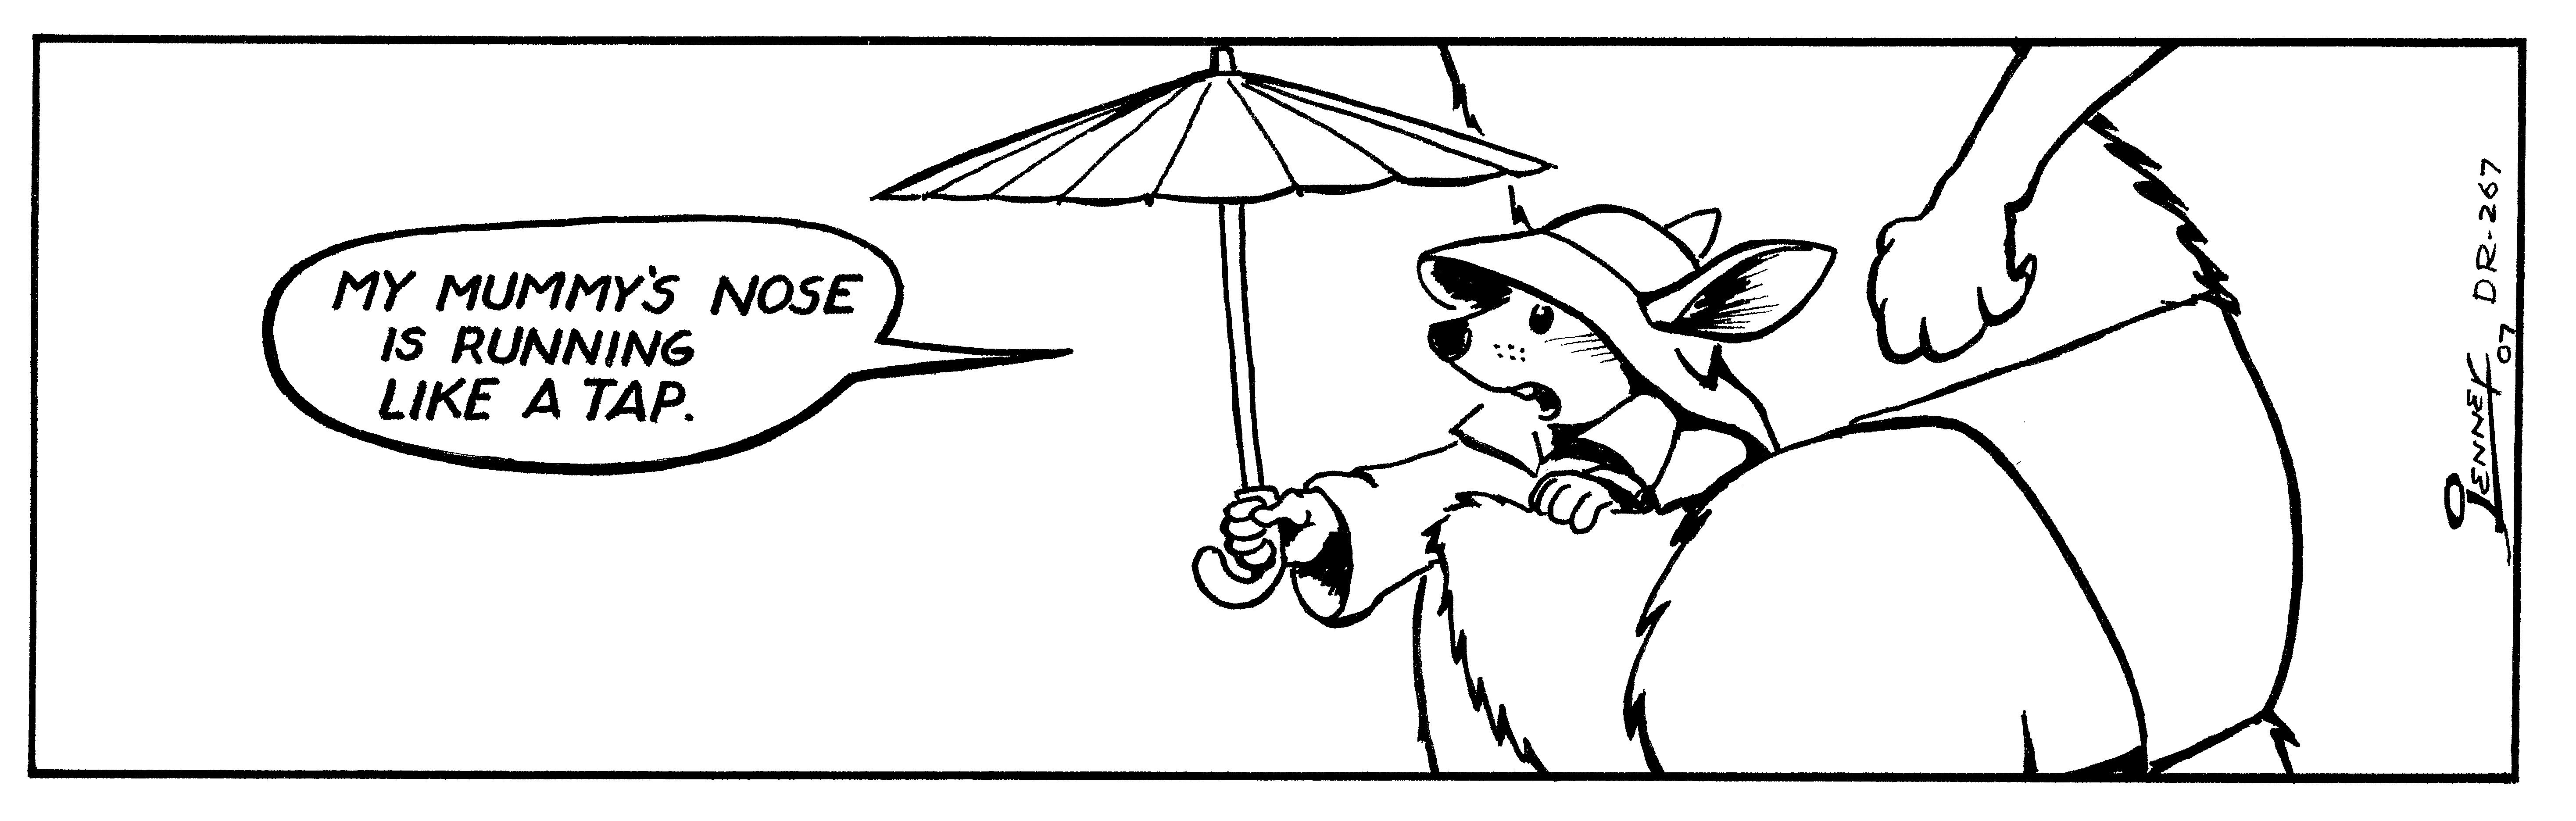 20060703